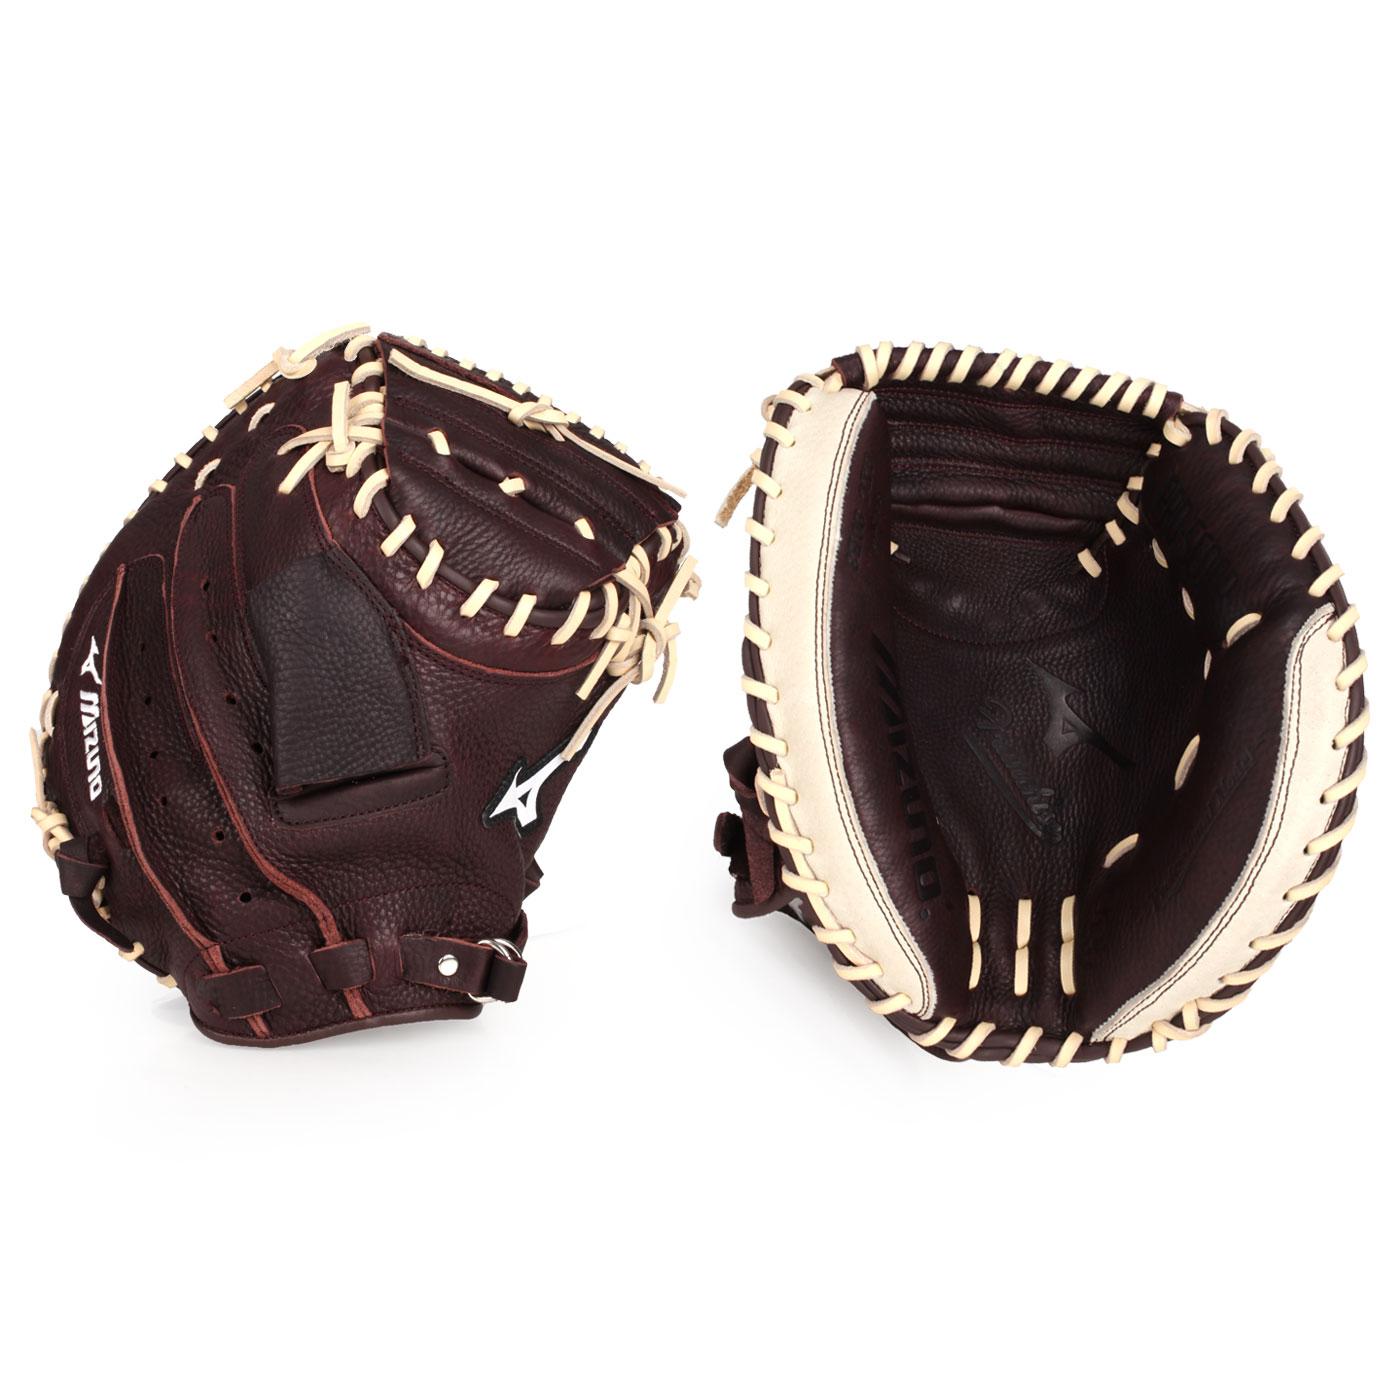 MIZUNO 棒球捕手手套(右投) 312736-R